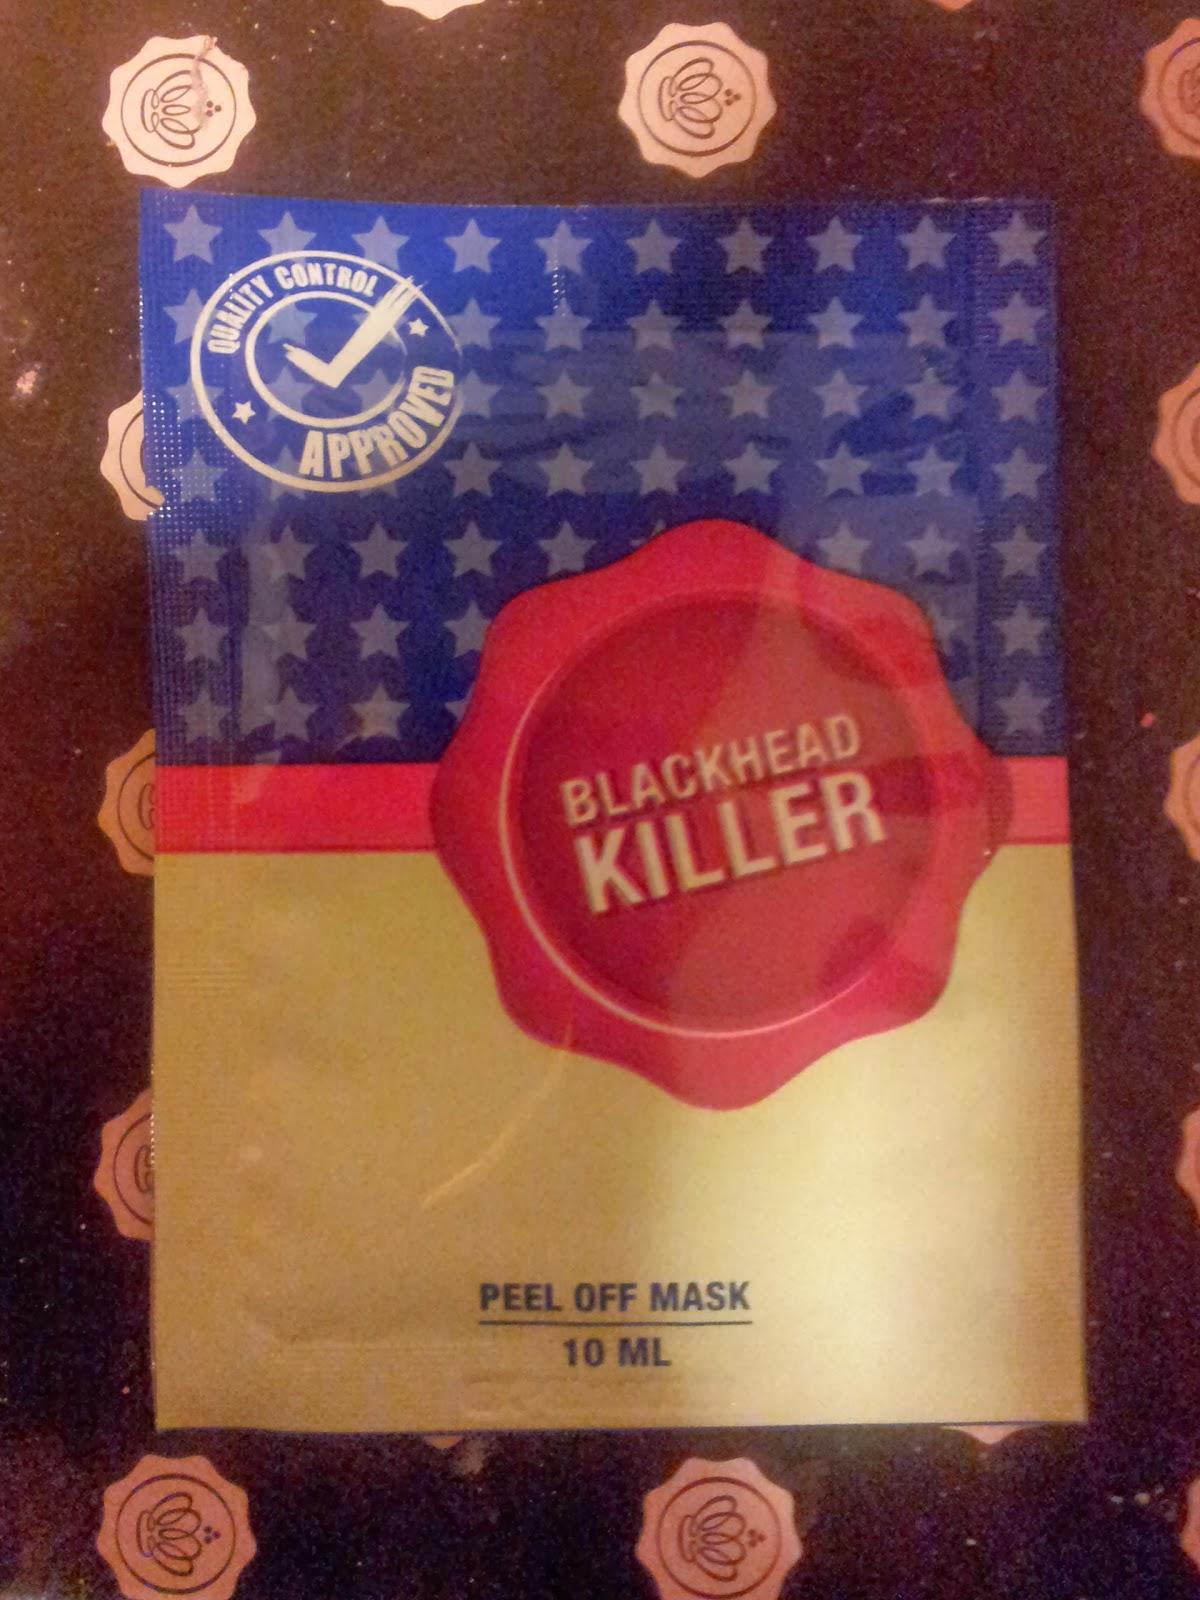 StyleLux Blackhead Killer Peel Off Mask Review